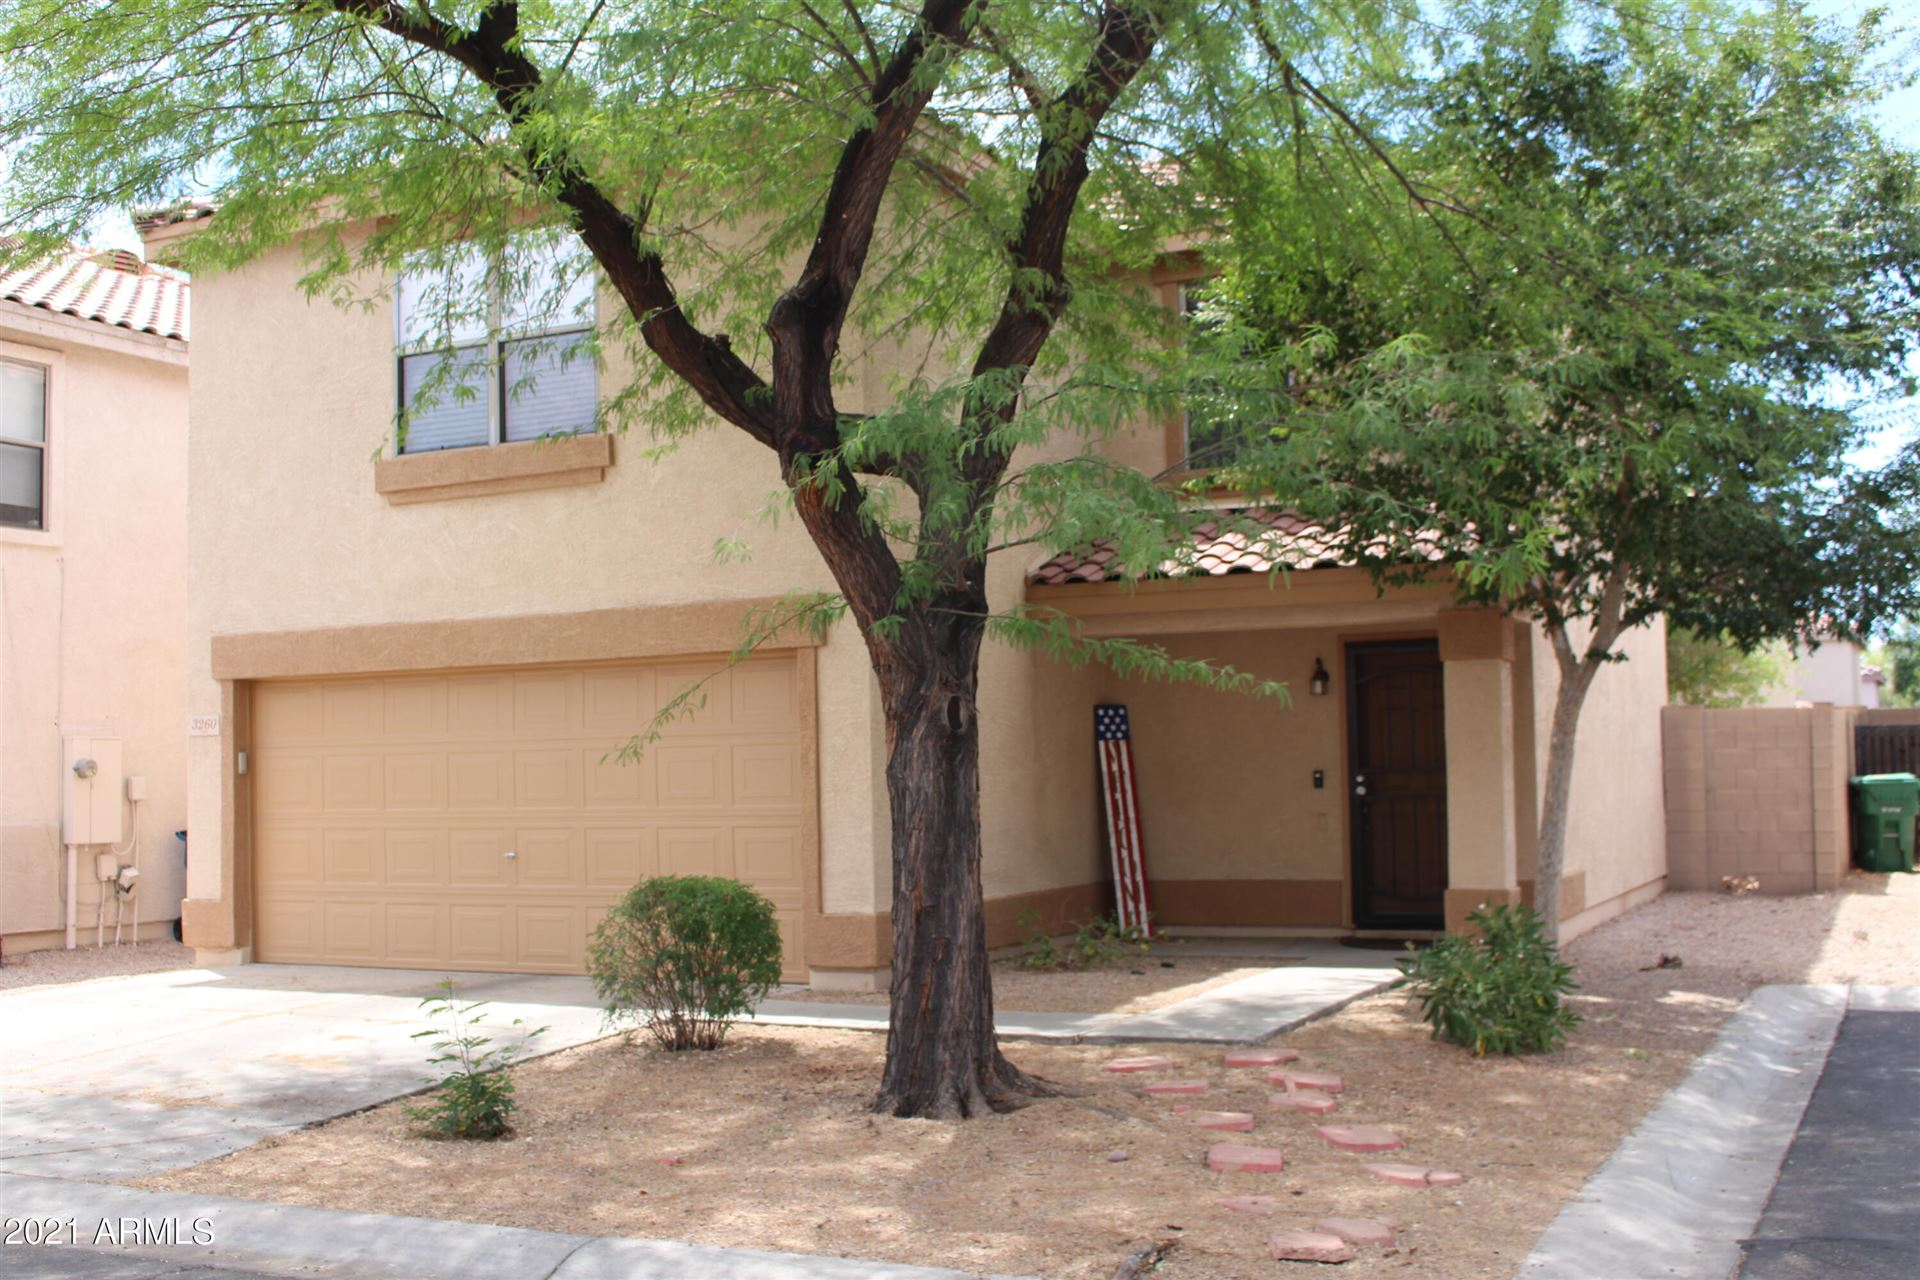 3260 S CONESTOGA Road, Apache Junction, AZ 85119 - MLS#: 6248164